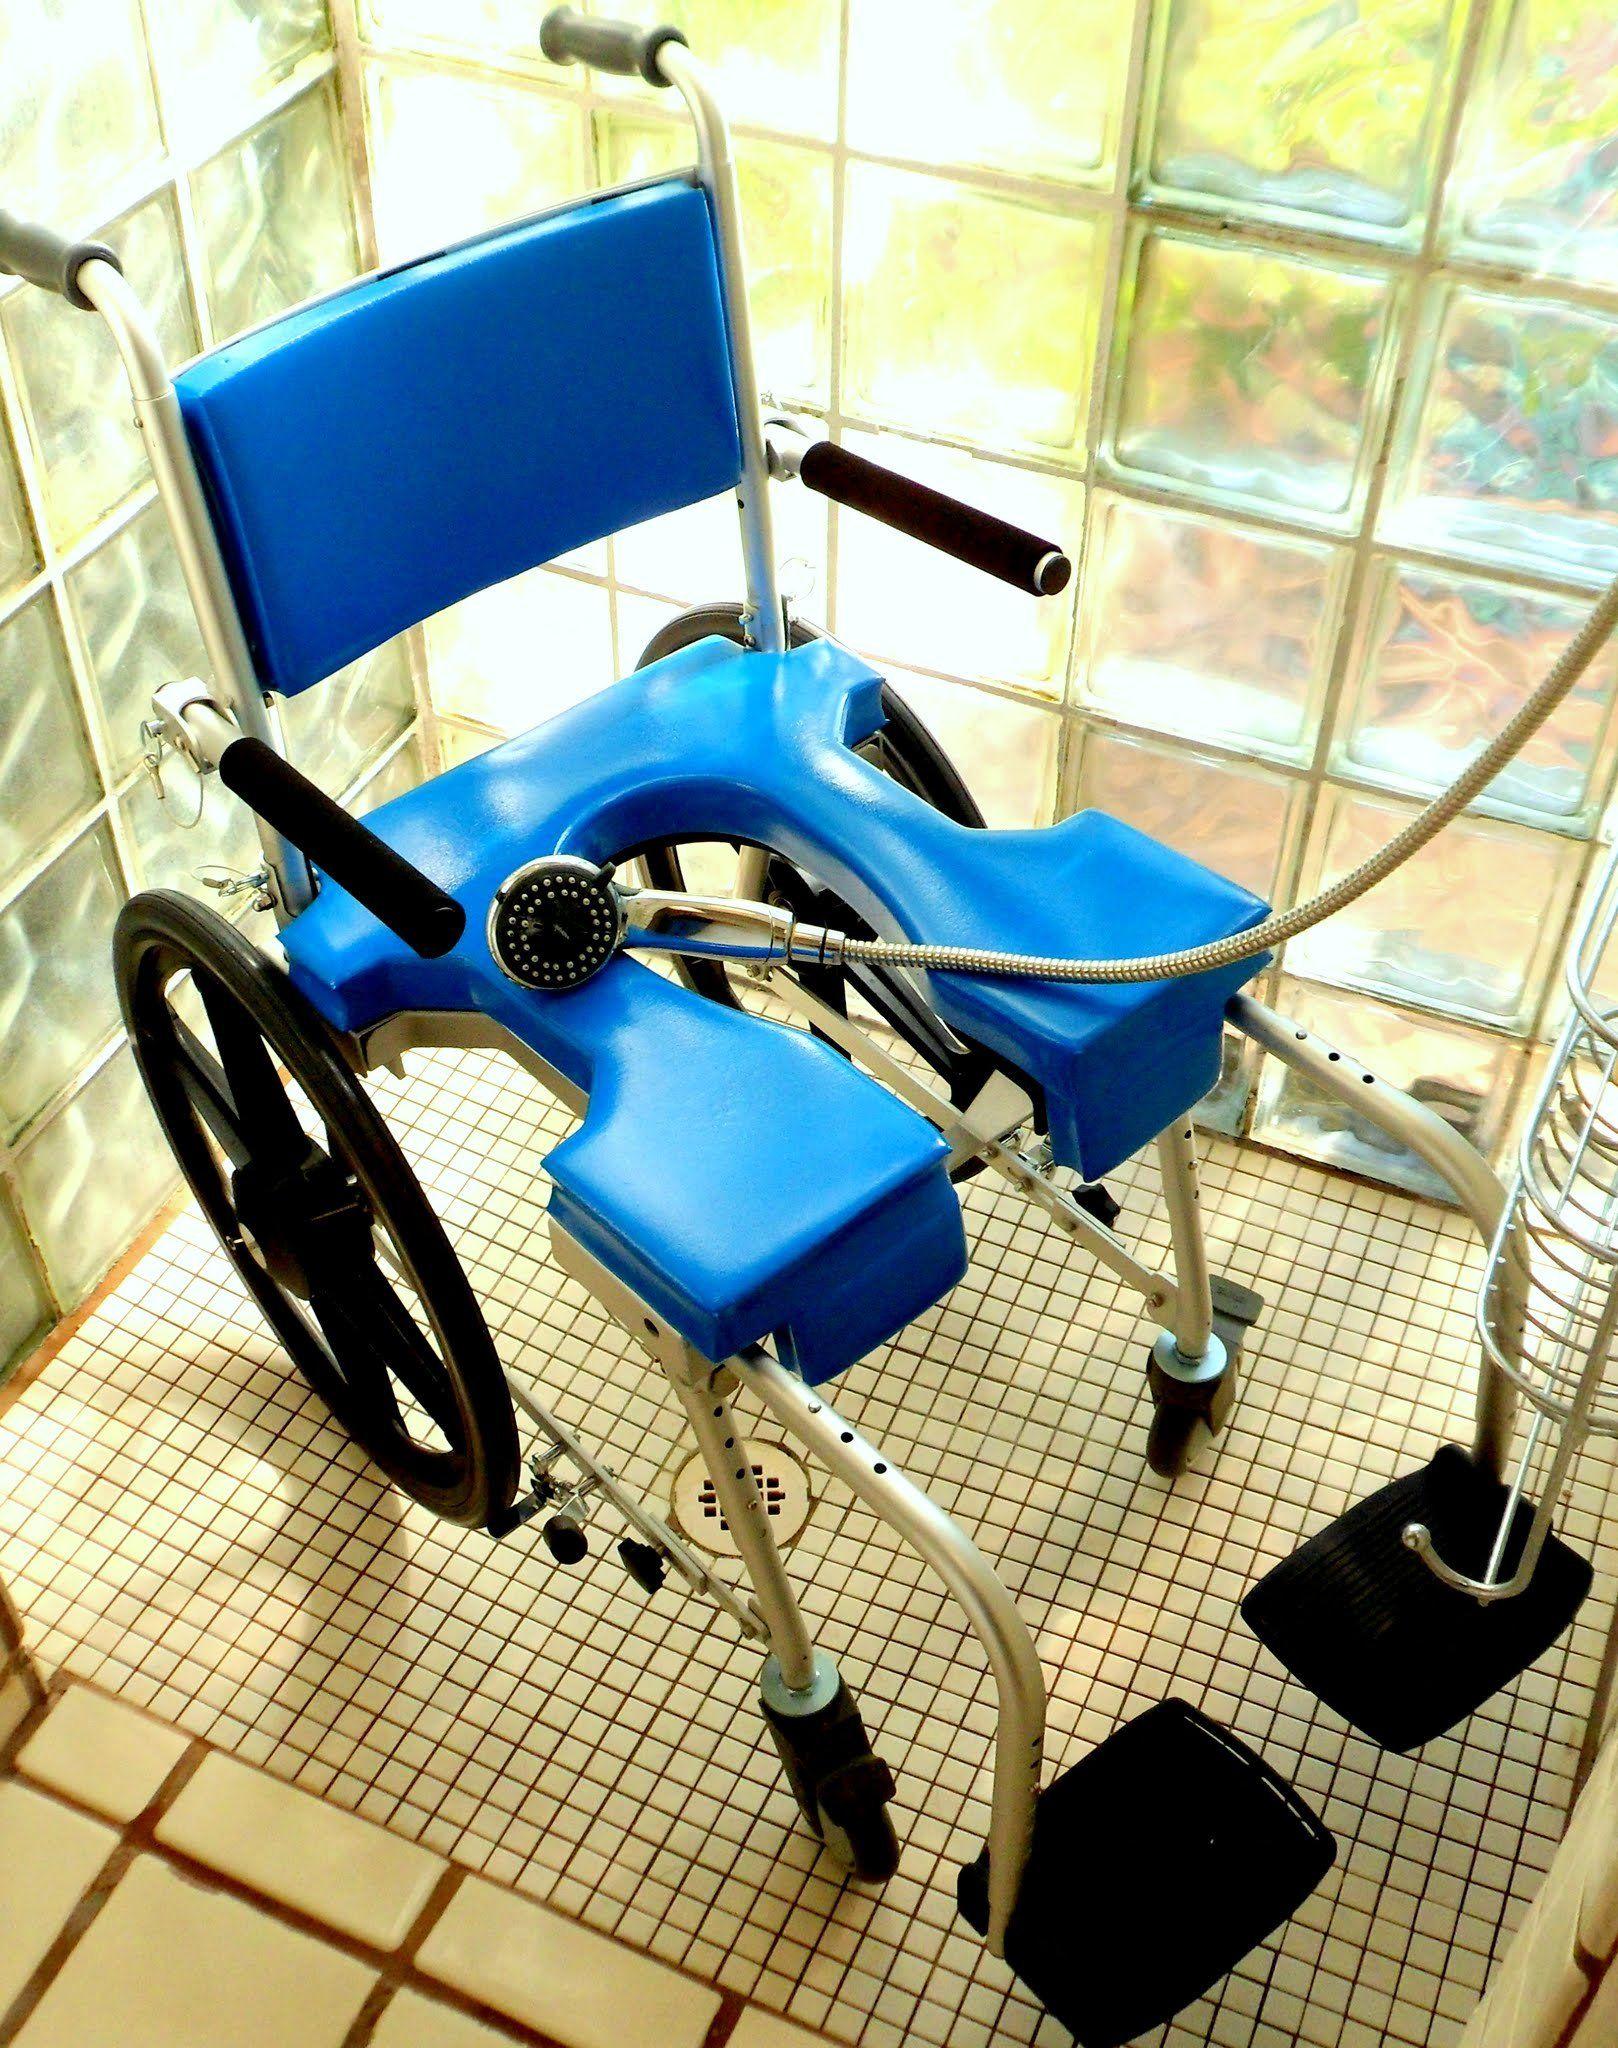 Goanywhere commode 'n shower chair selfpropel (sp